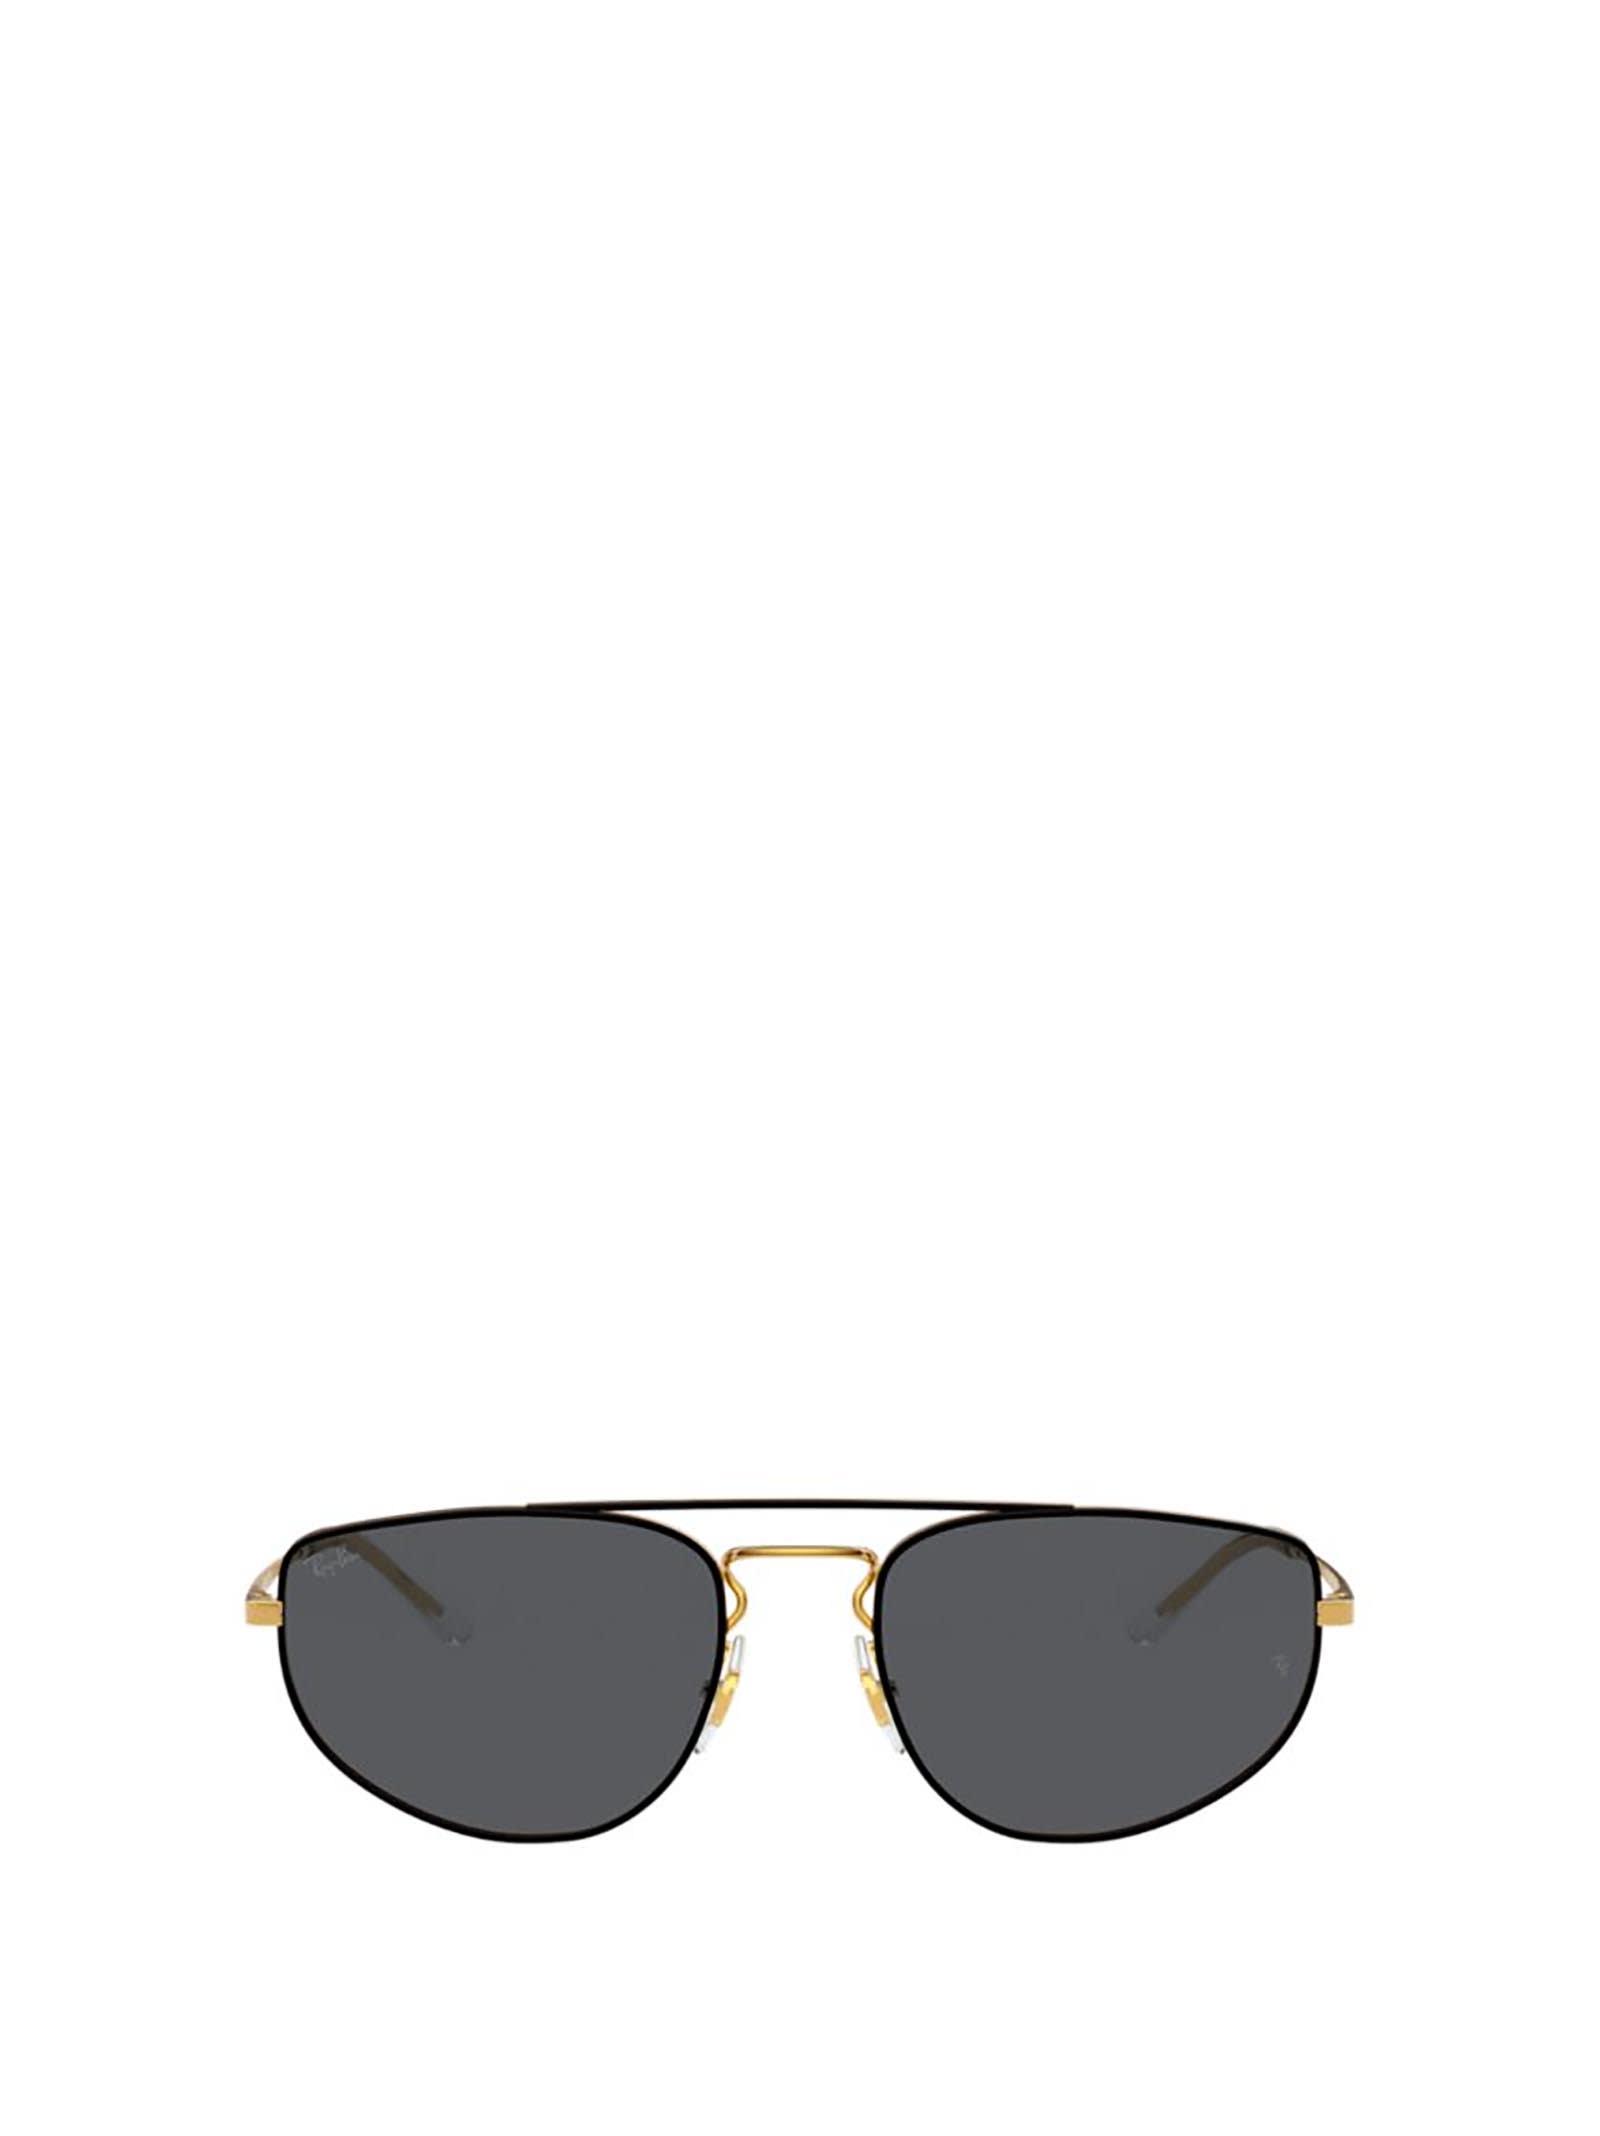 Ray-Ban Ray-ban Rb3669 Black On Arista Sunglasses